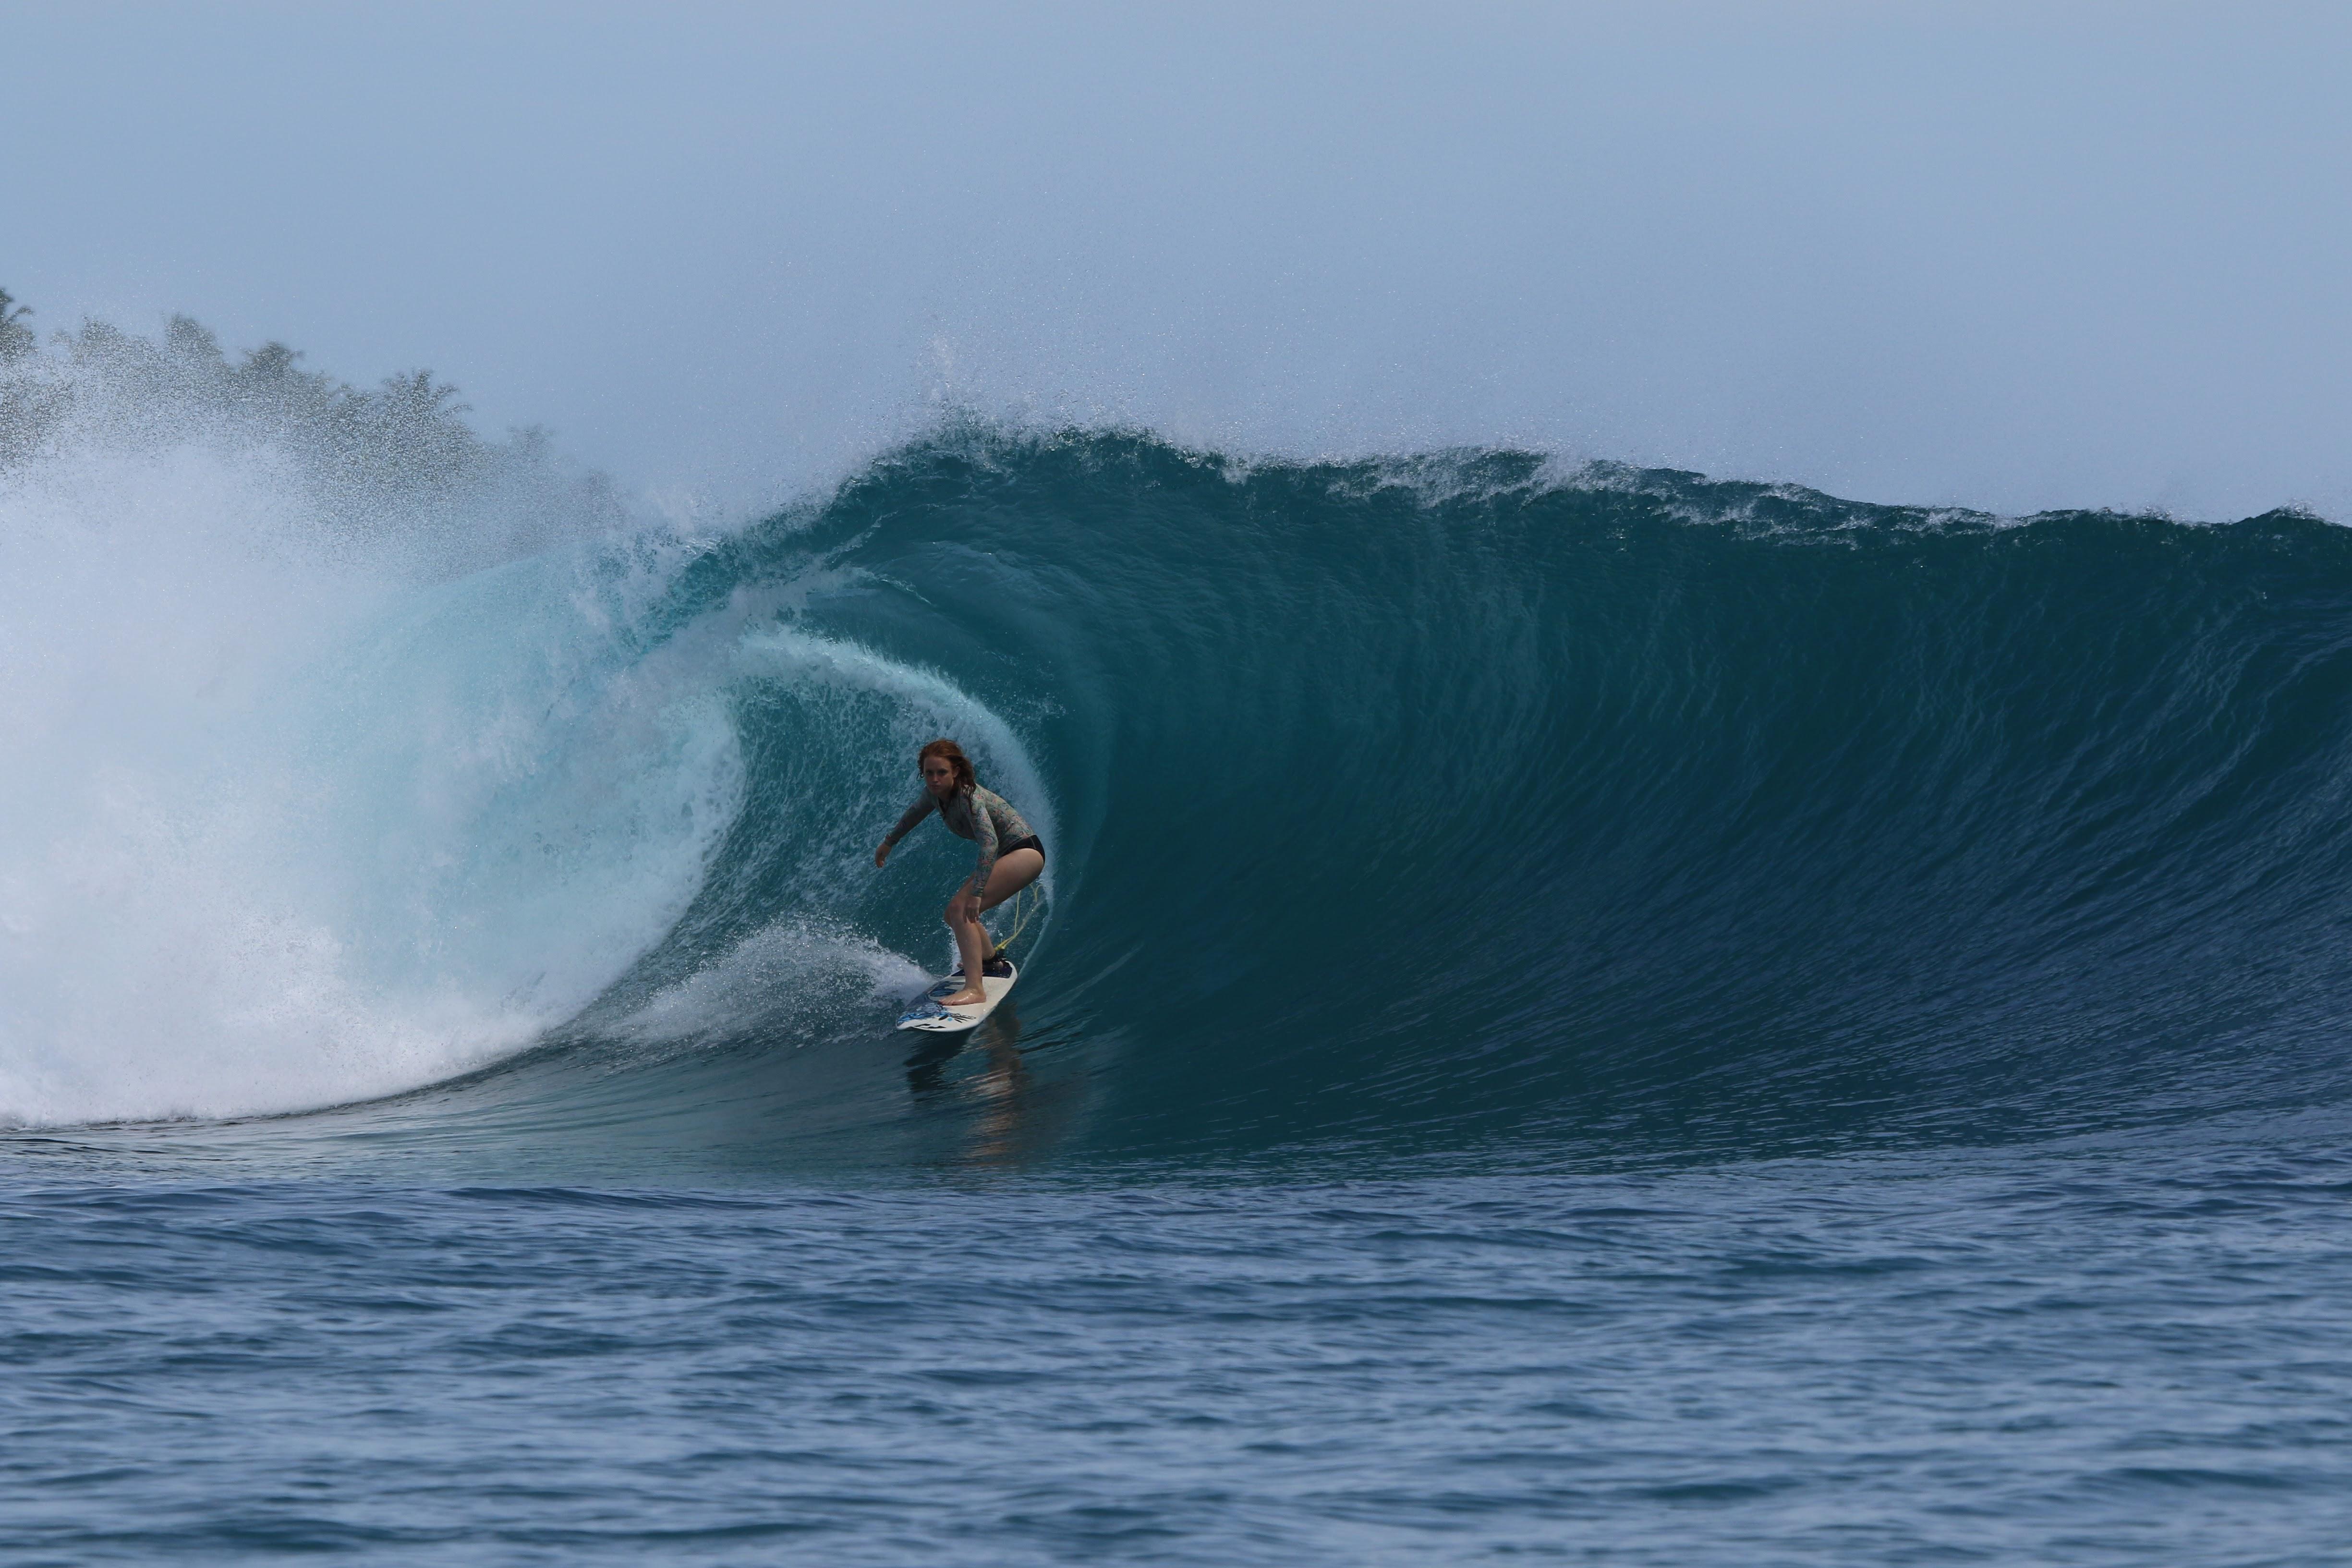 Grace Doyle surfing